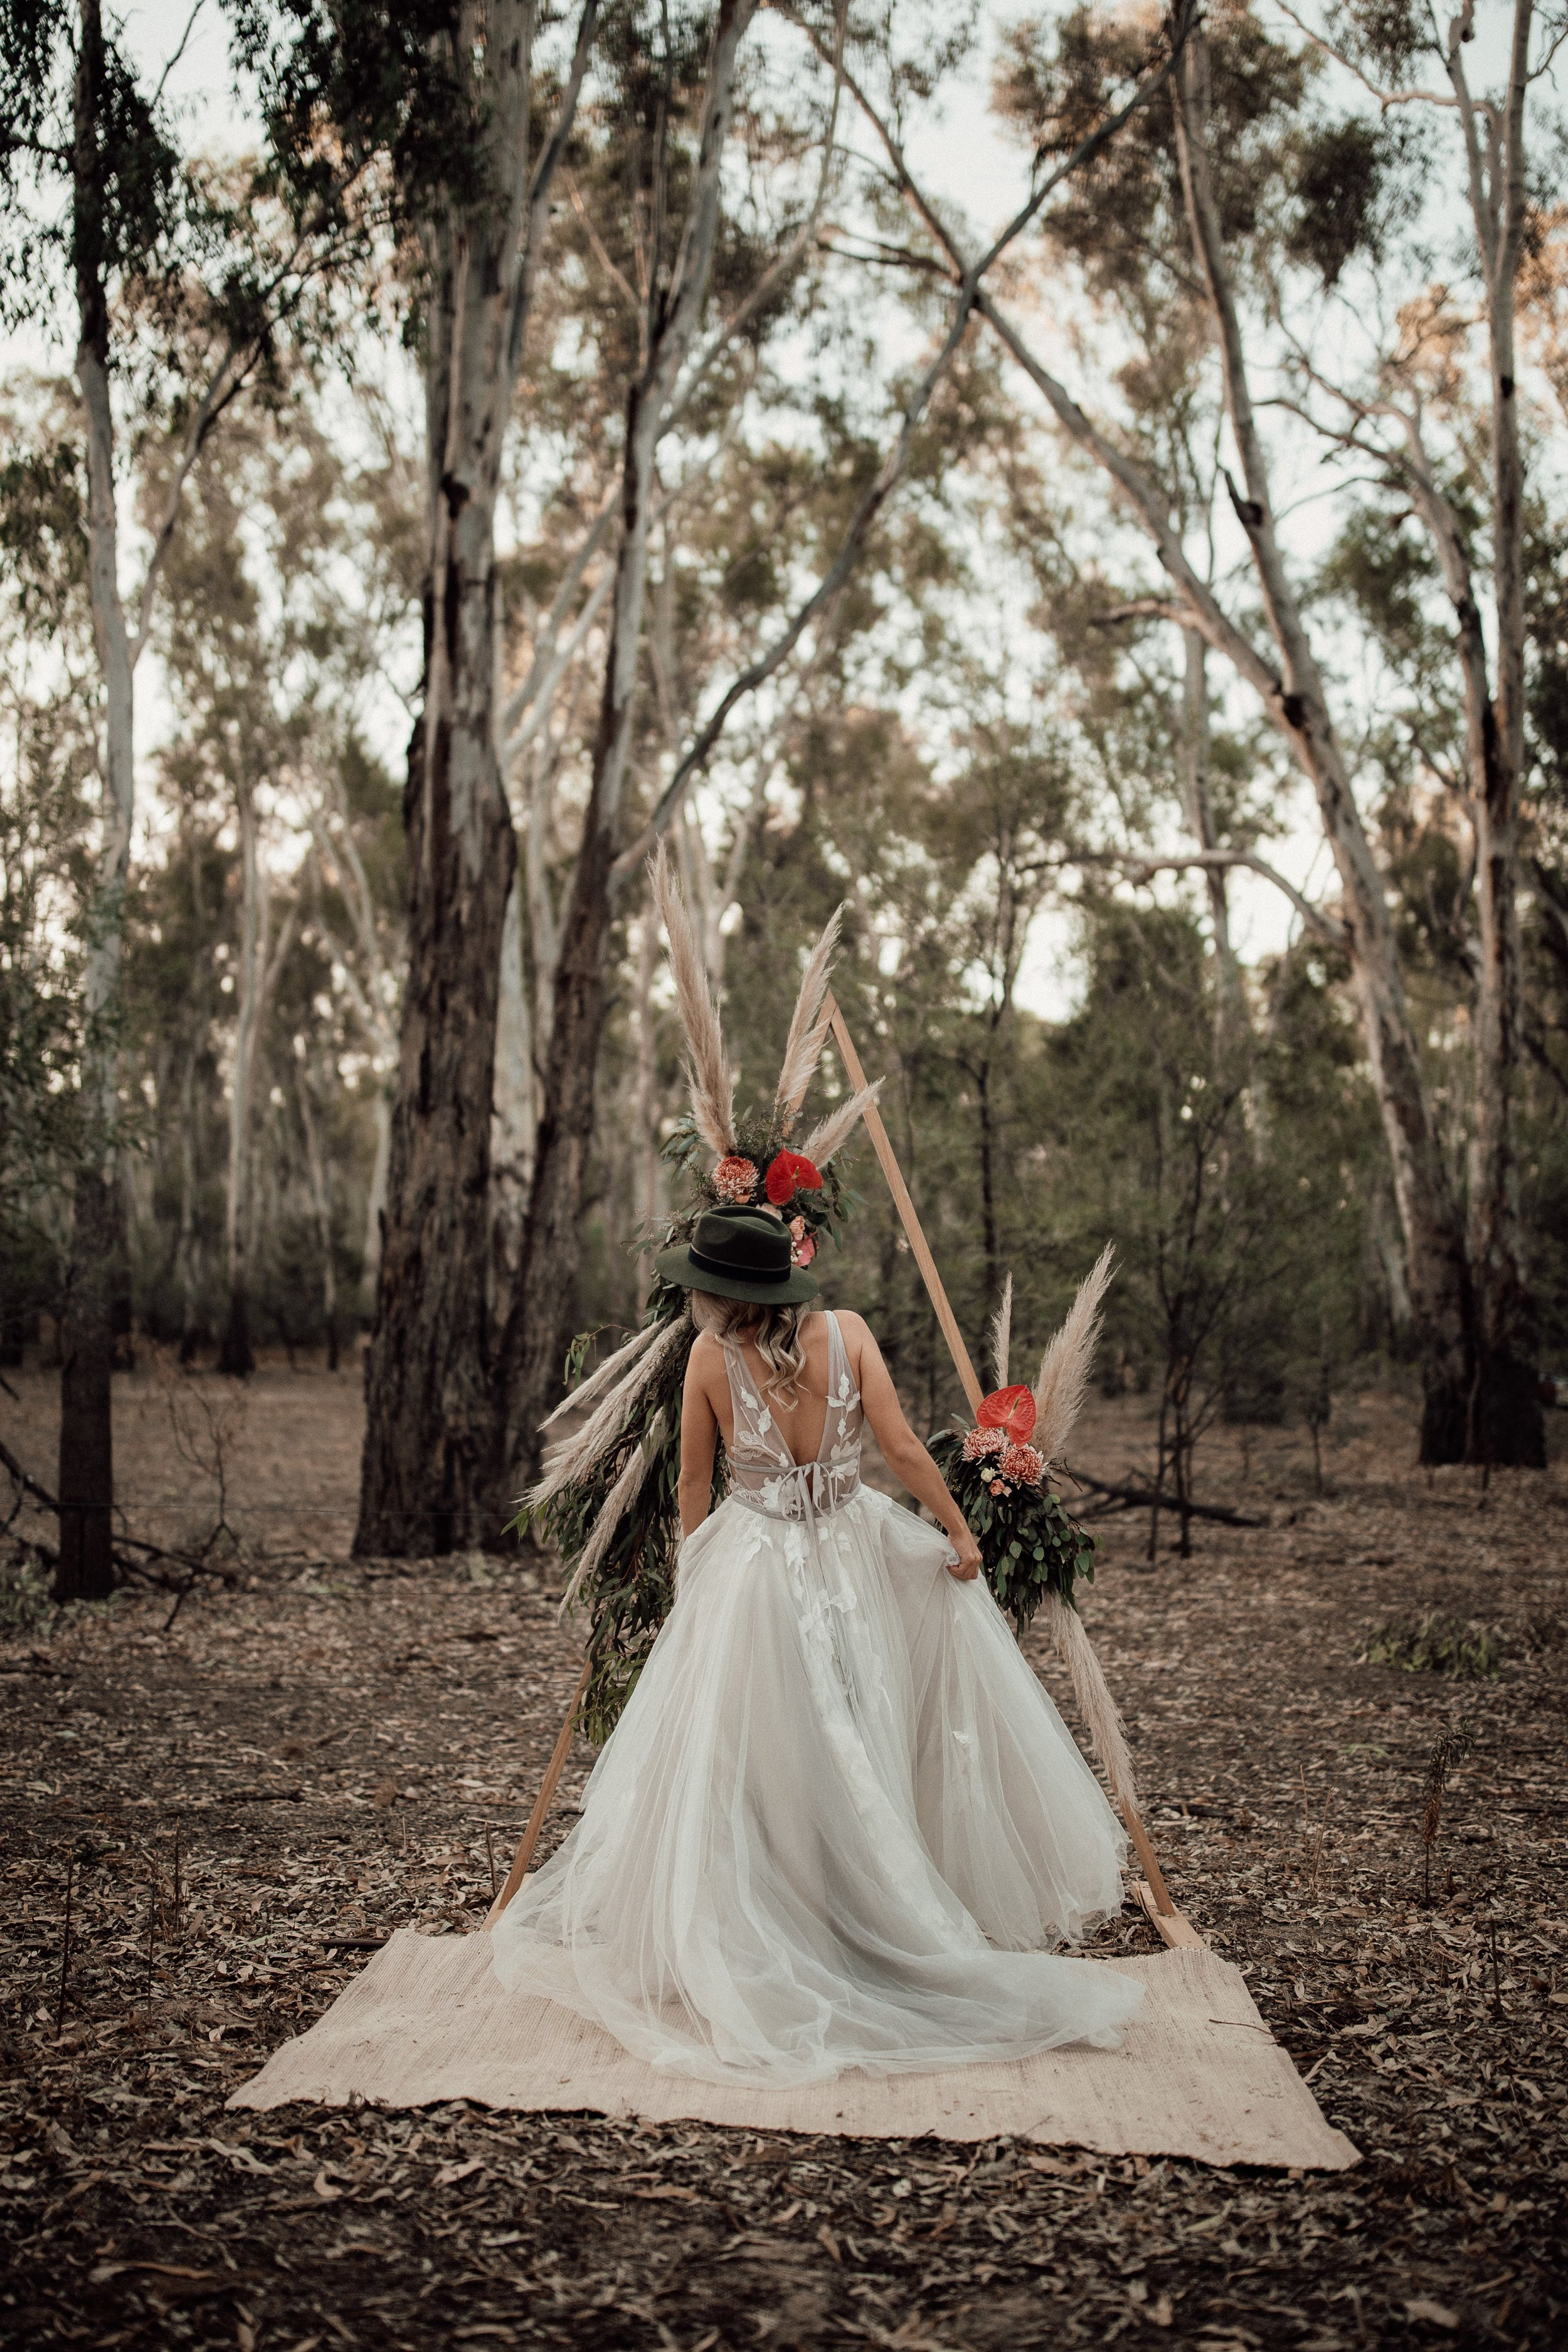 mickalathomas_puremacphotography_weddingphotographer_couplephotographer_Sheppartonphotographer_1500.jpg